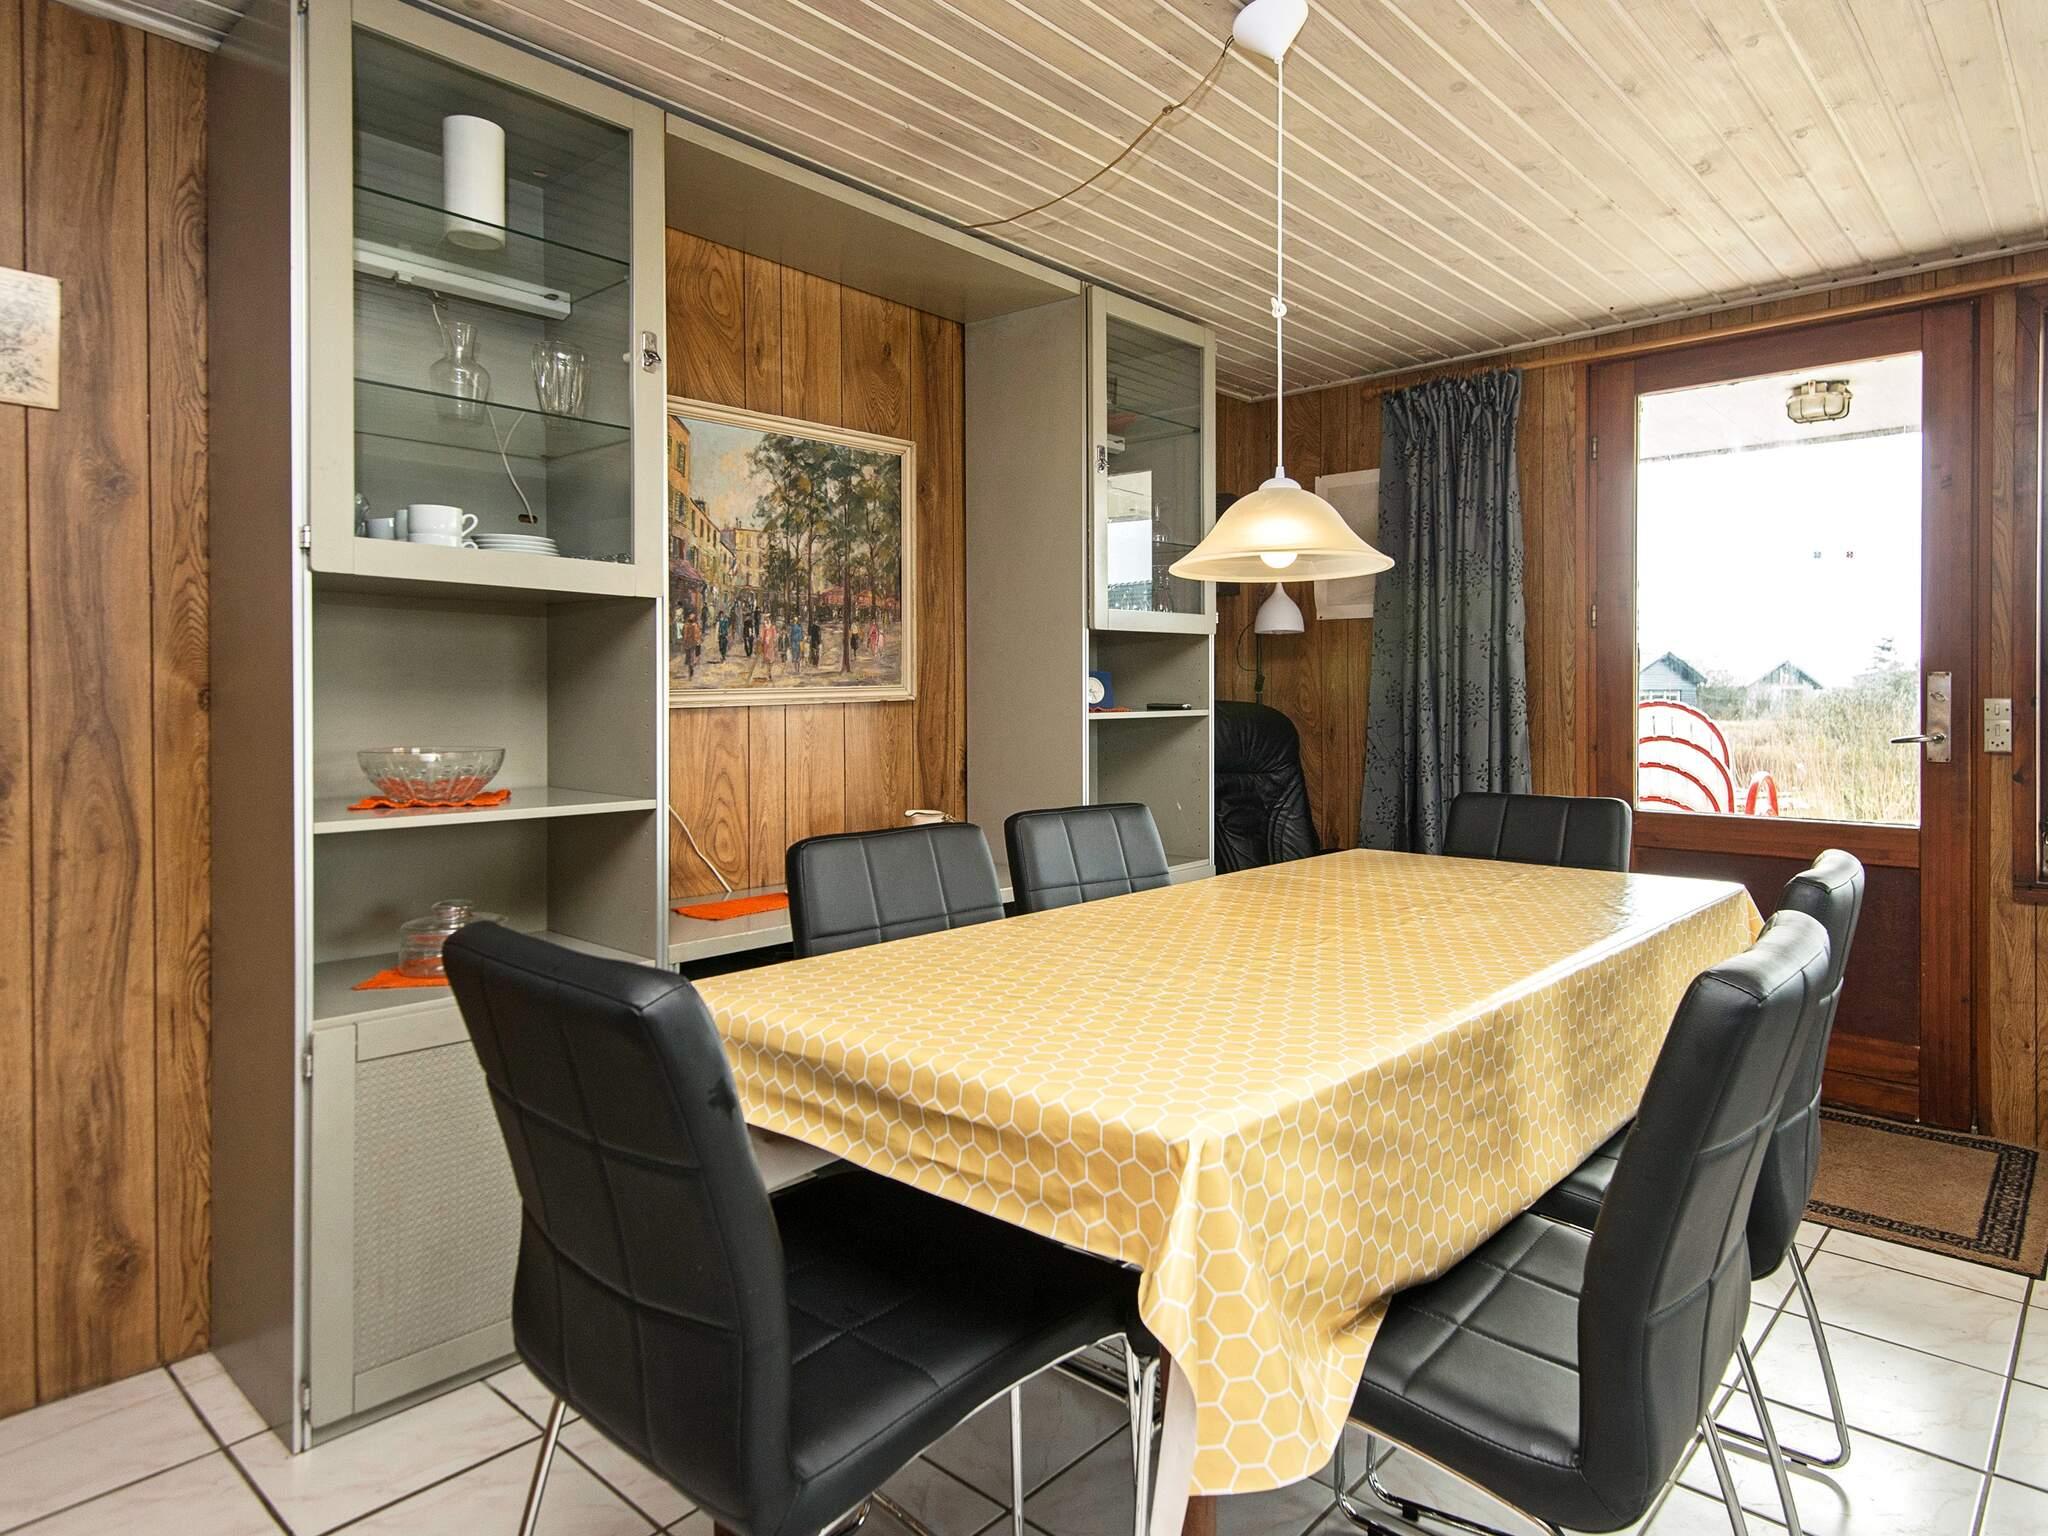 Ferienhaus Rømø/Lakolk (84097), Rømø, , Südwestjütland, Dänemark, Bild 5